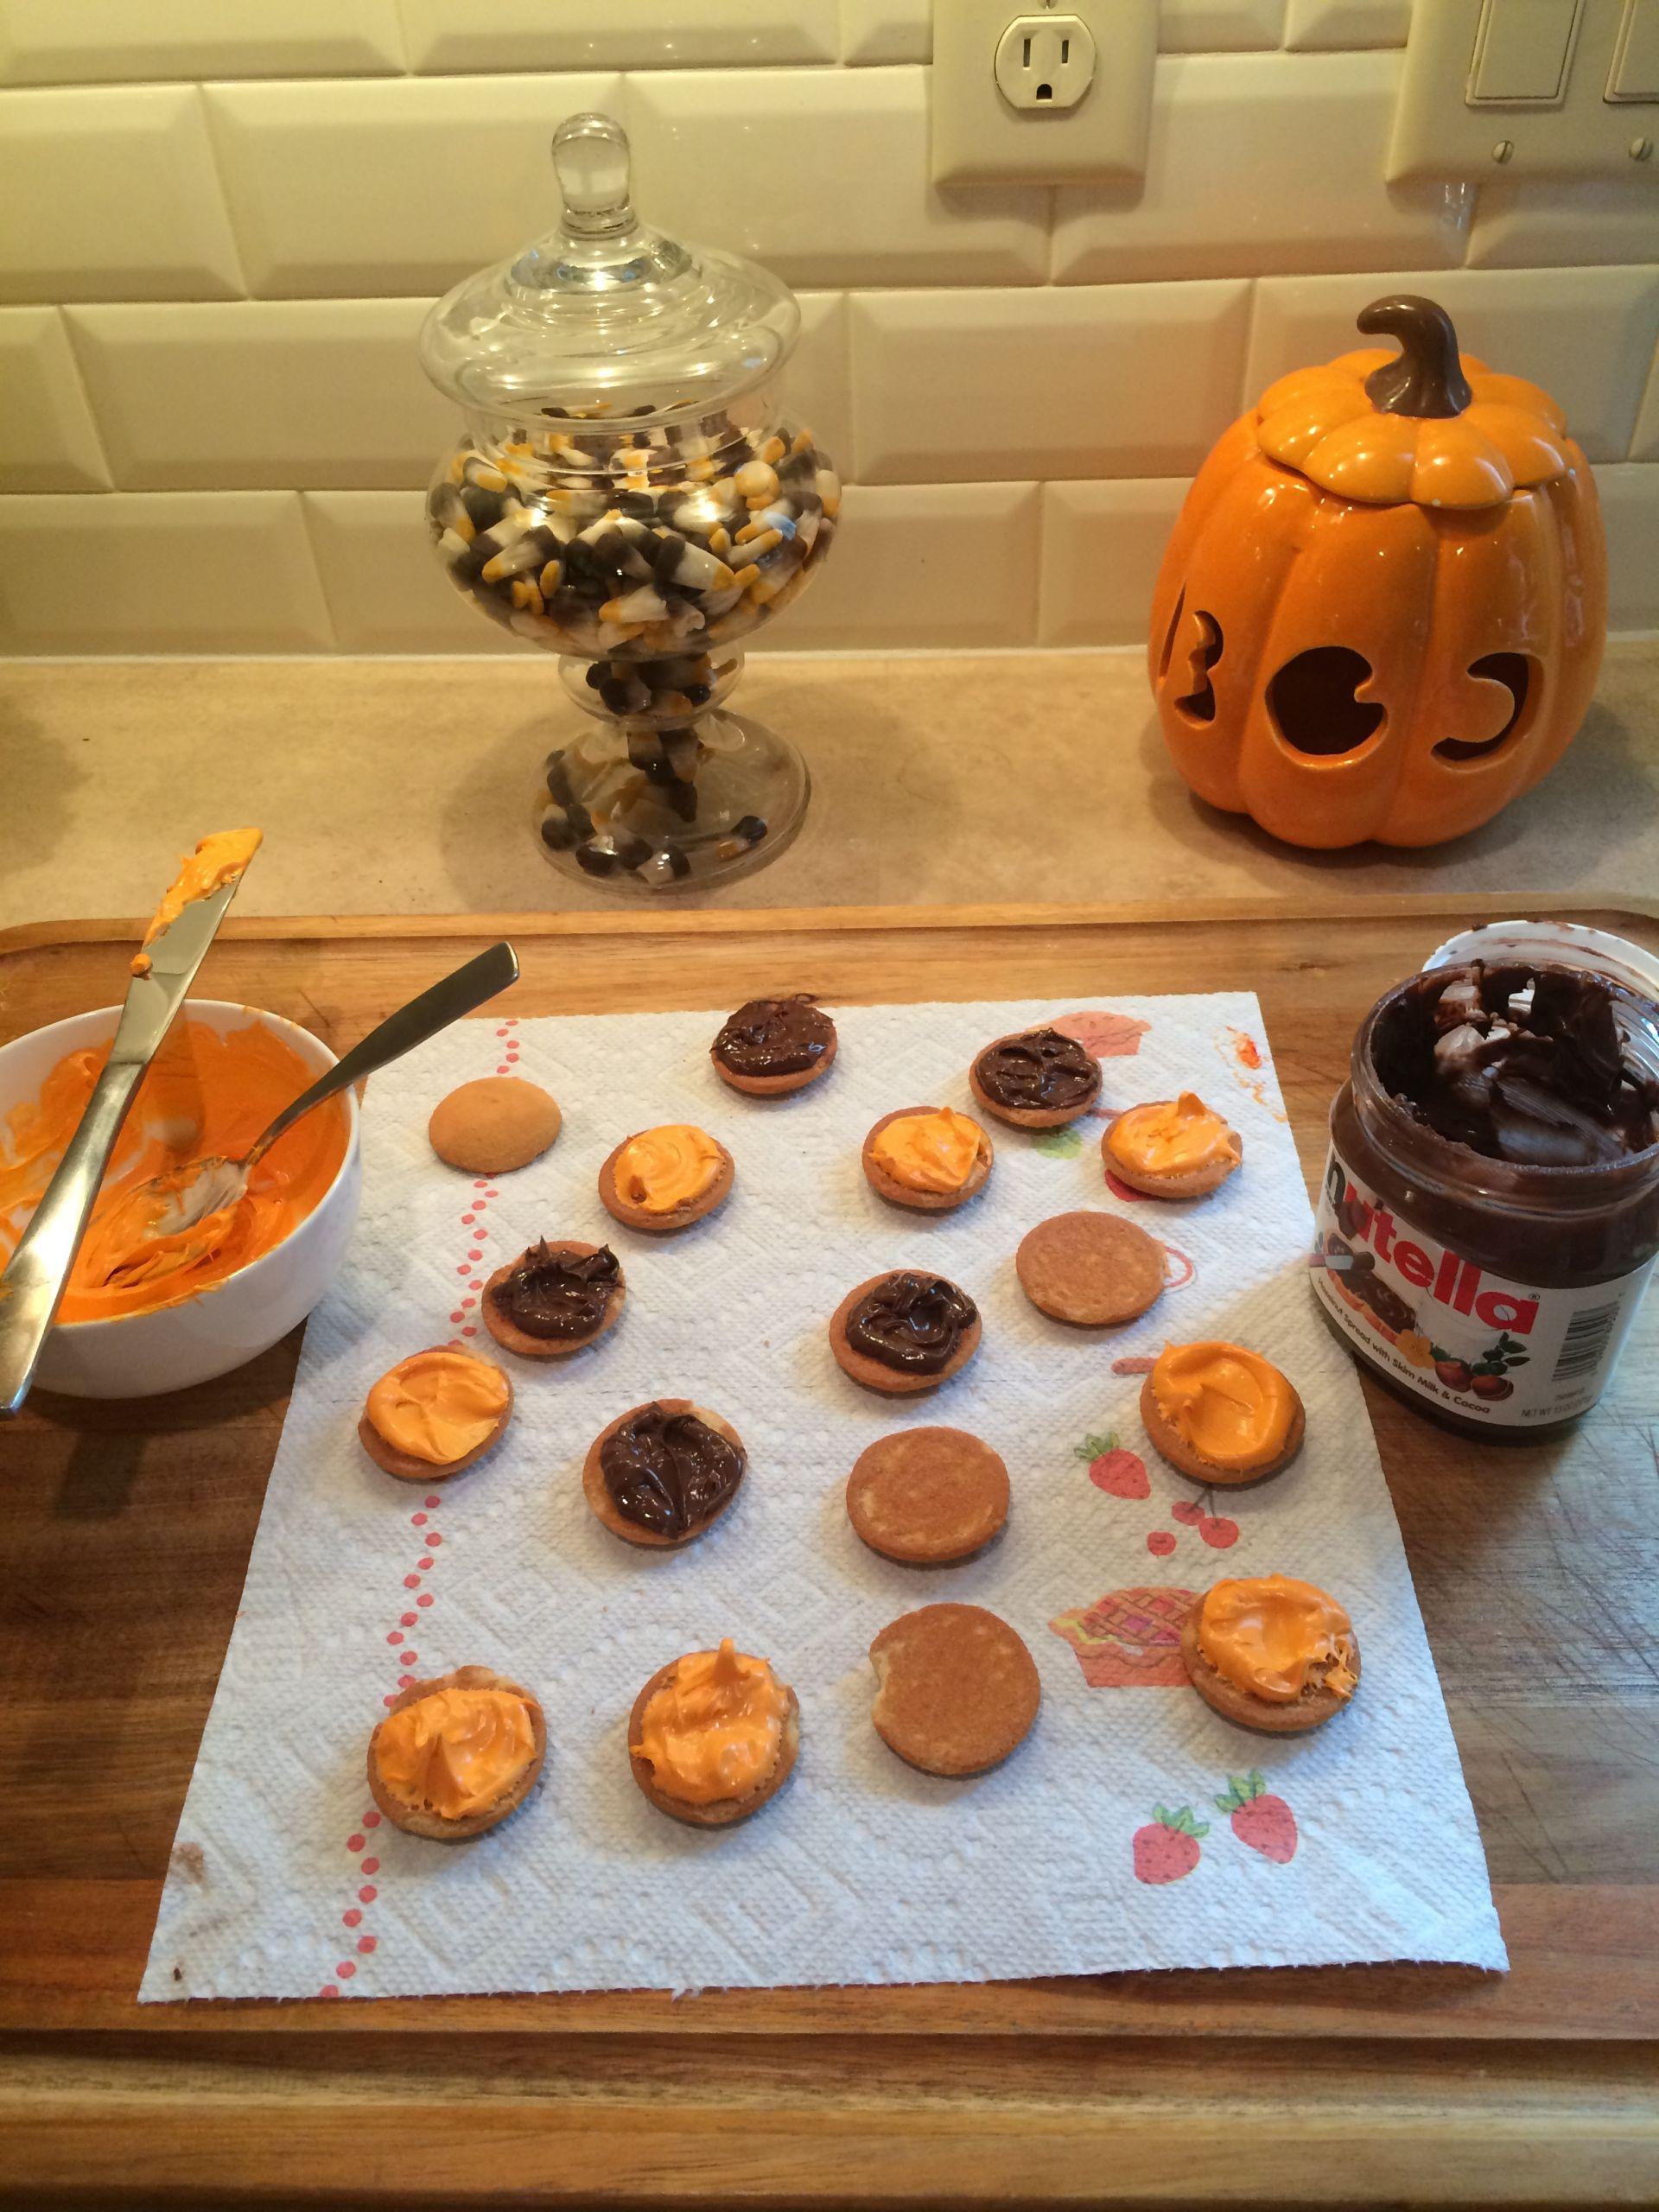 Halloween Party Ideen Inspirierend Easy Halloween Party Treats for Kids